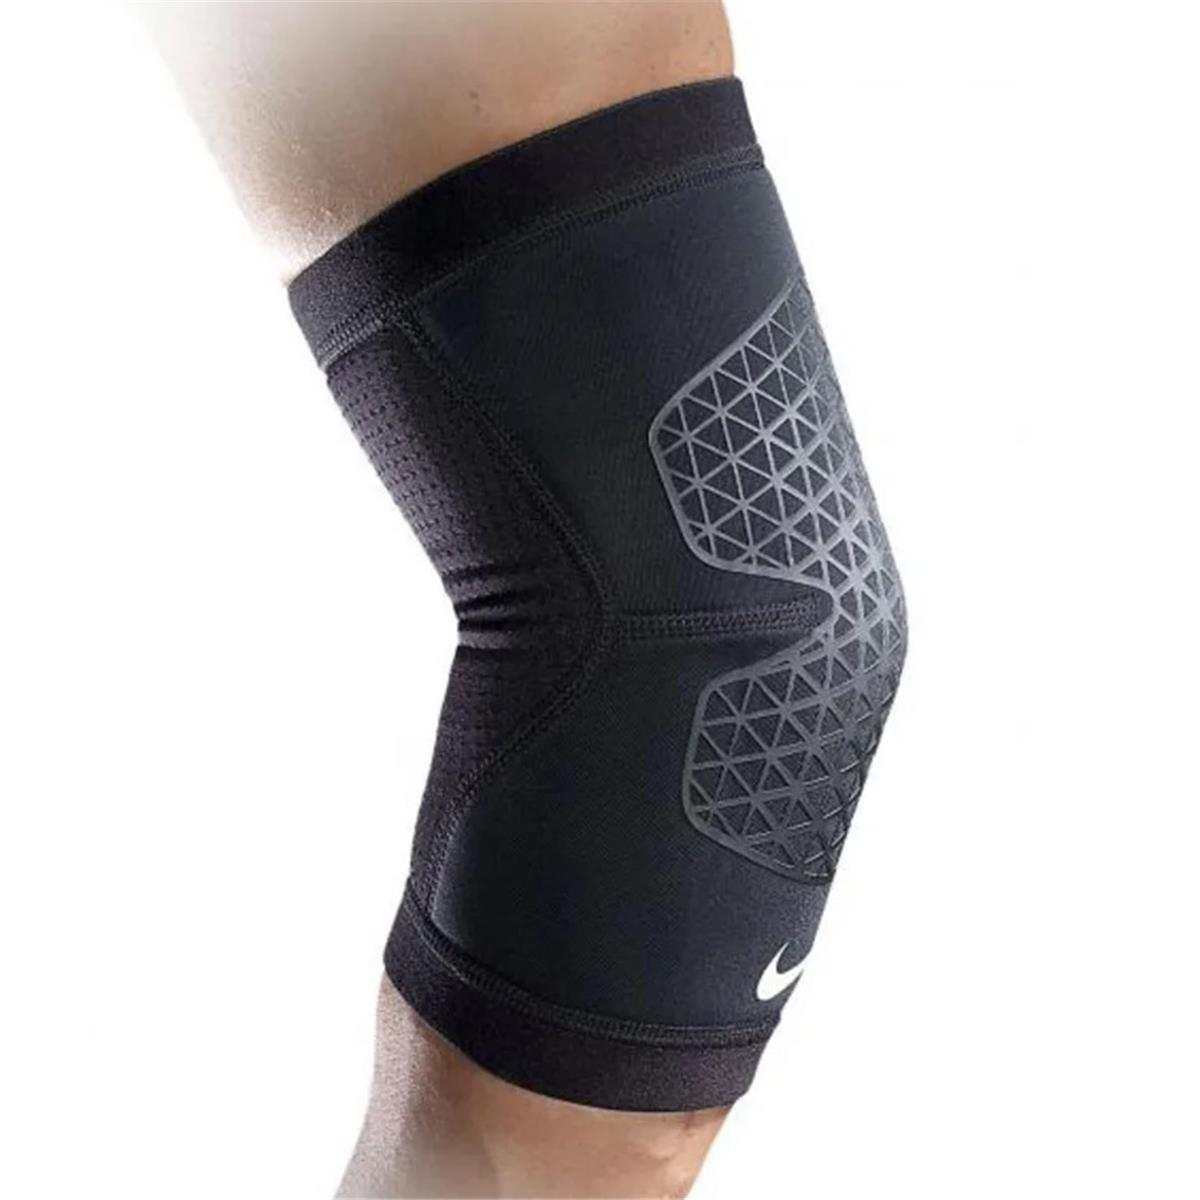 a3f35cc2aa Nike Pro Combat Elbow Sleeve (Black) | Direct Running